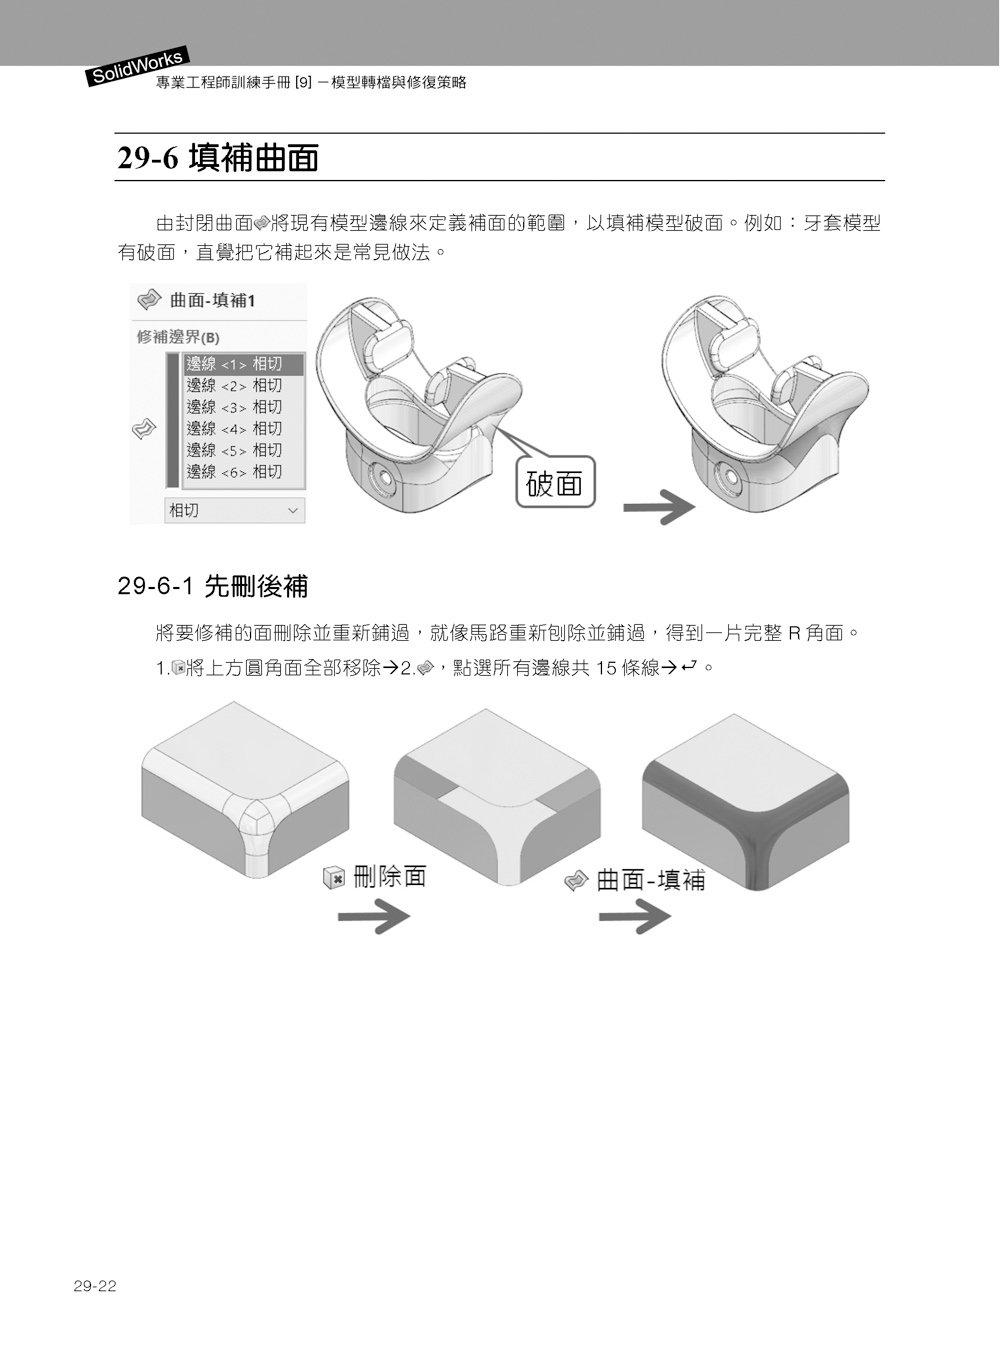 Solidworks 專業工程師訓練手冊[9]-模型轉檔與修復策略-preview-25